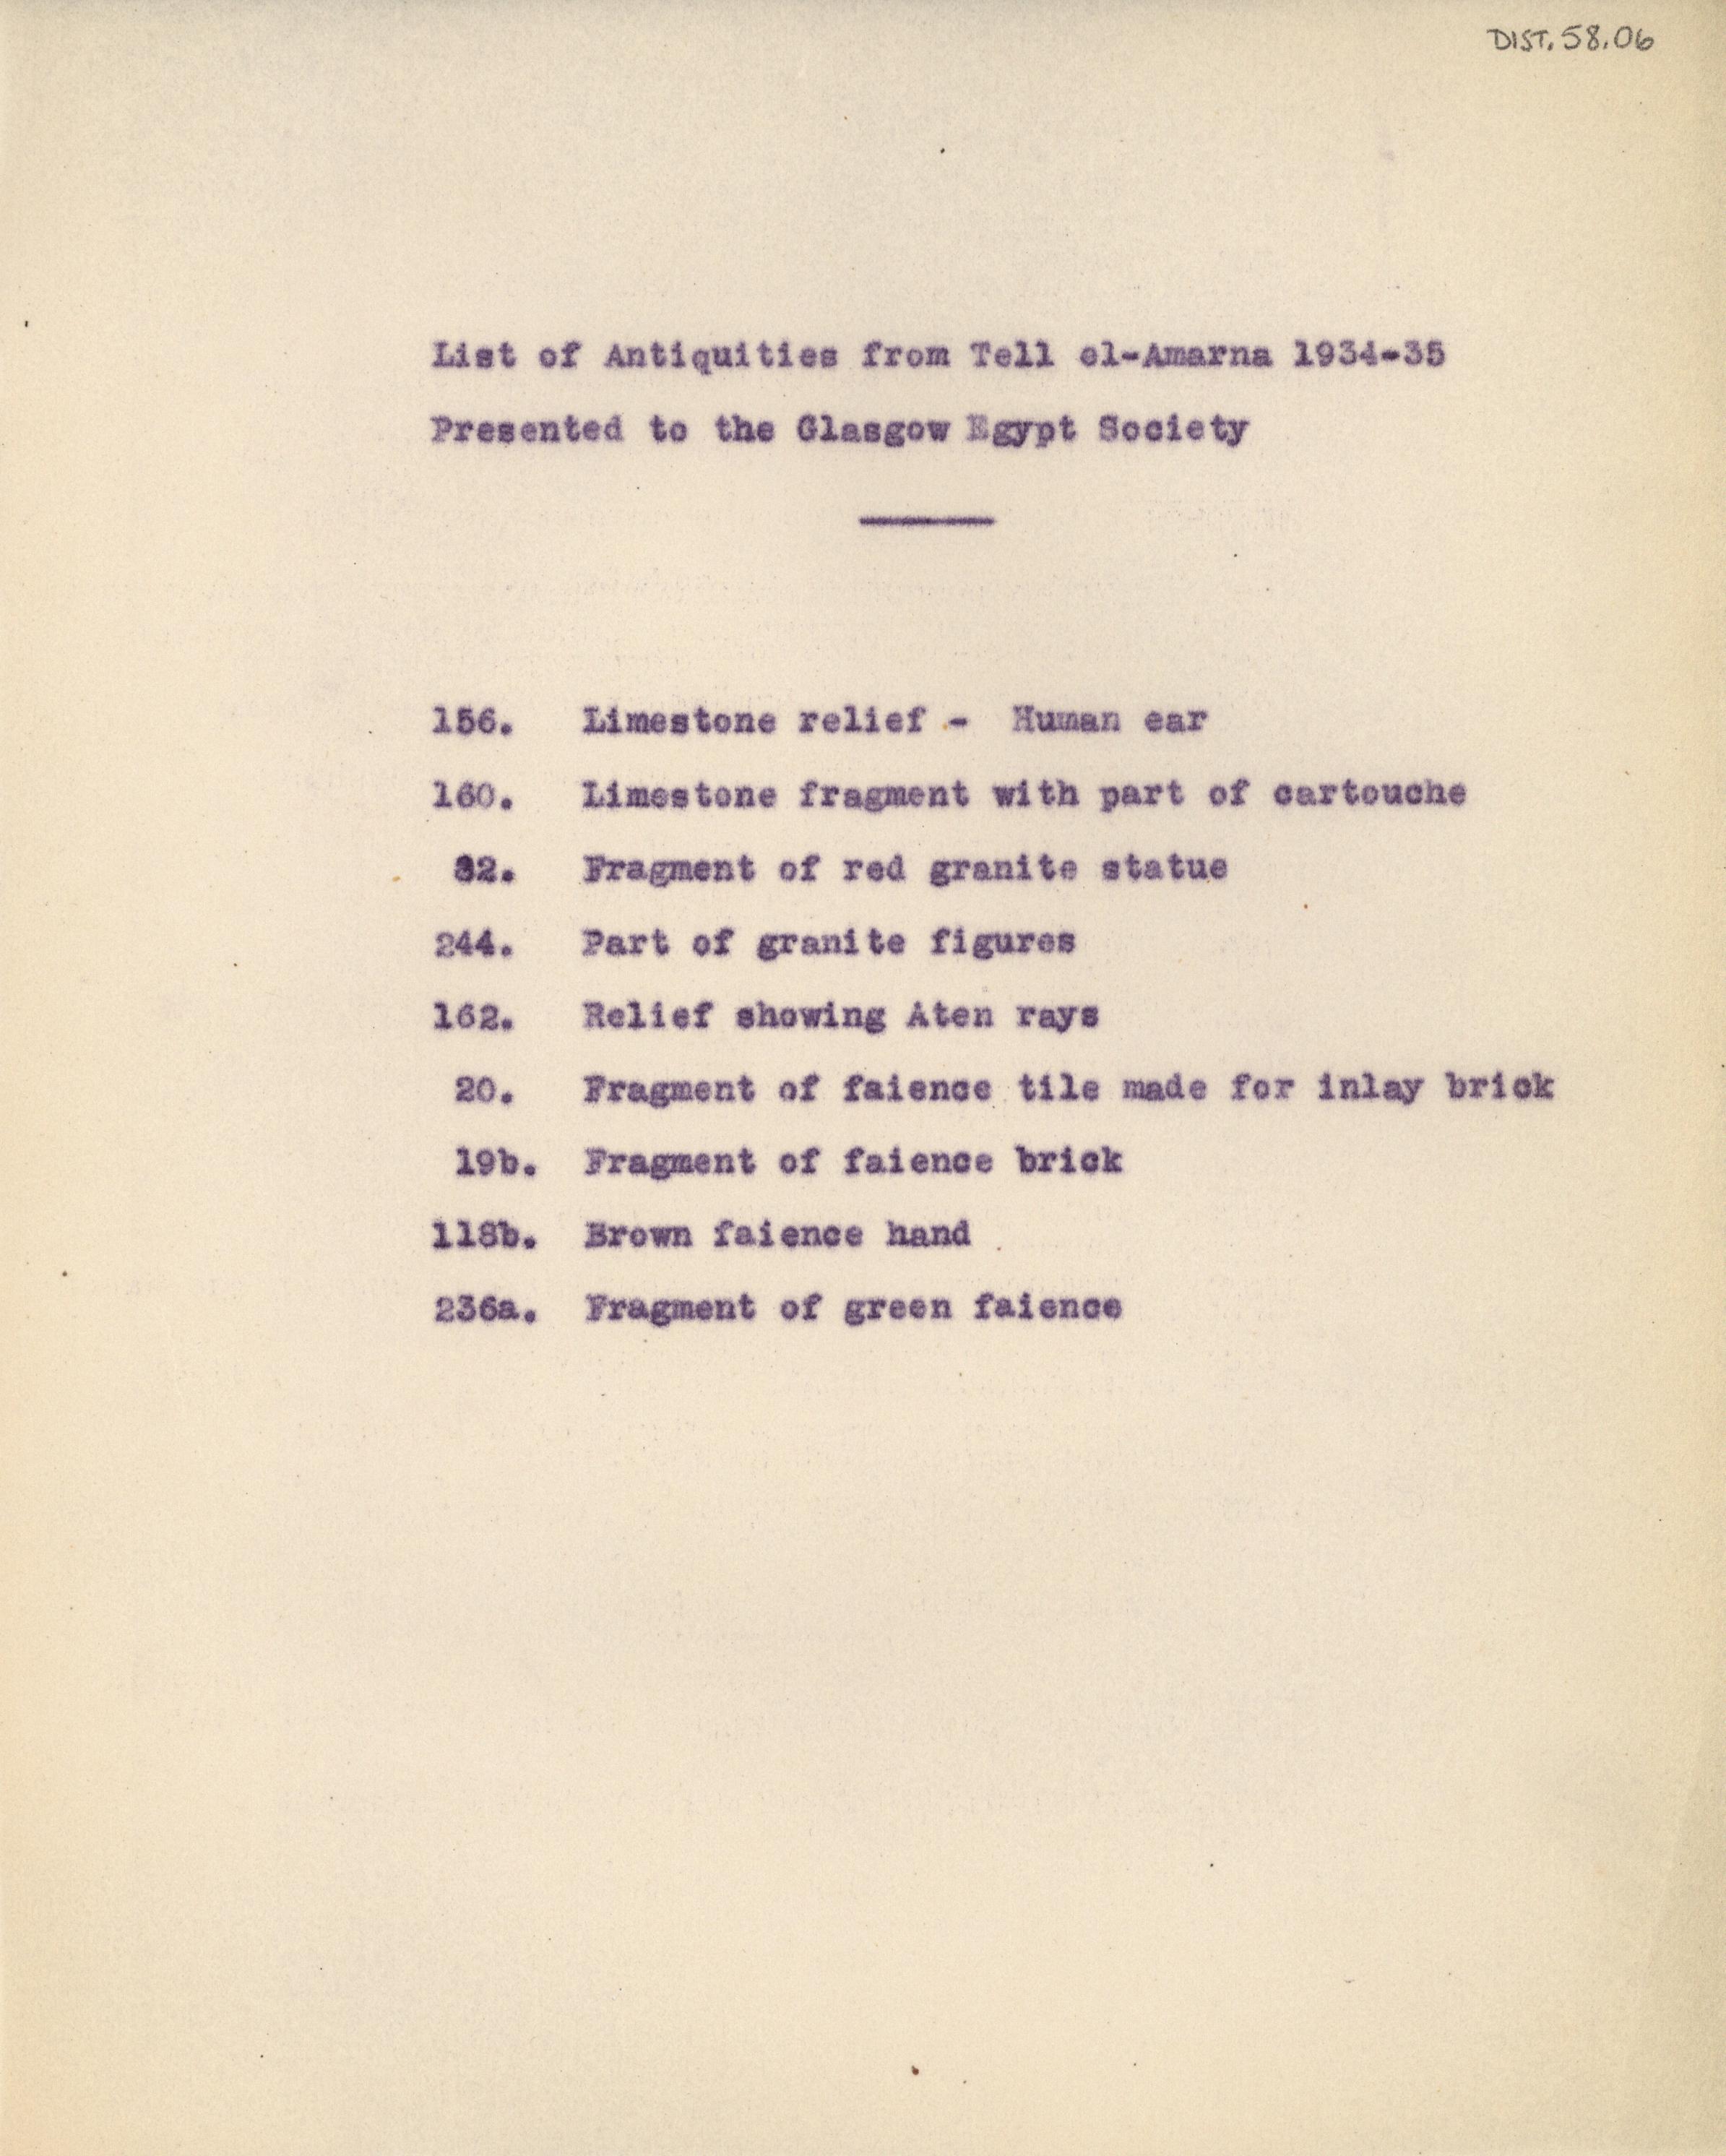 1934-35 el-Amarna DIST.58.06